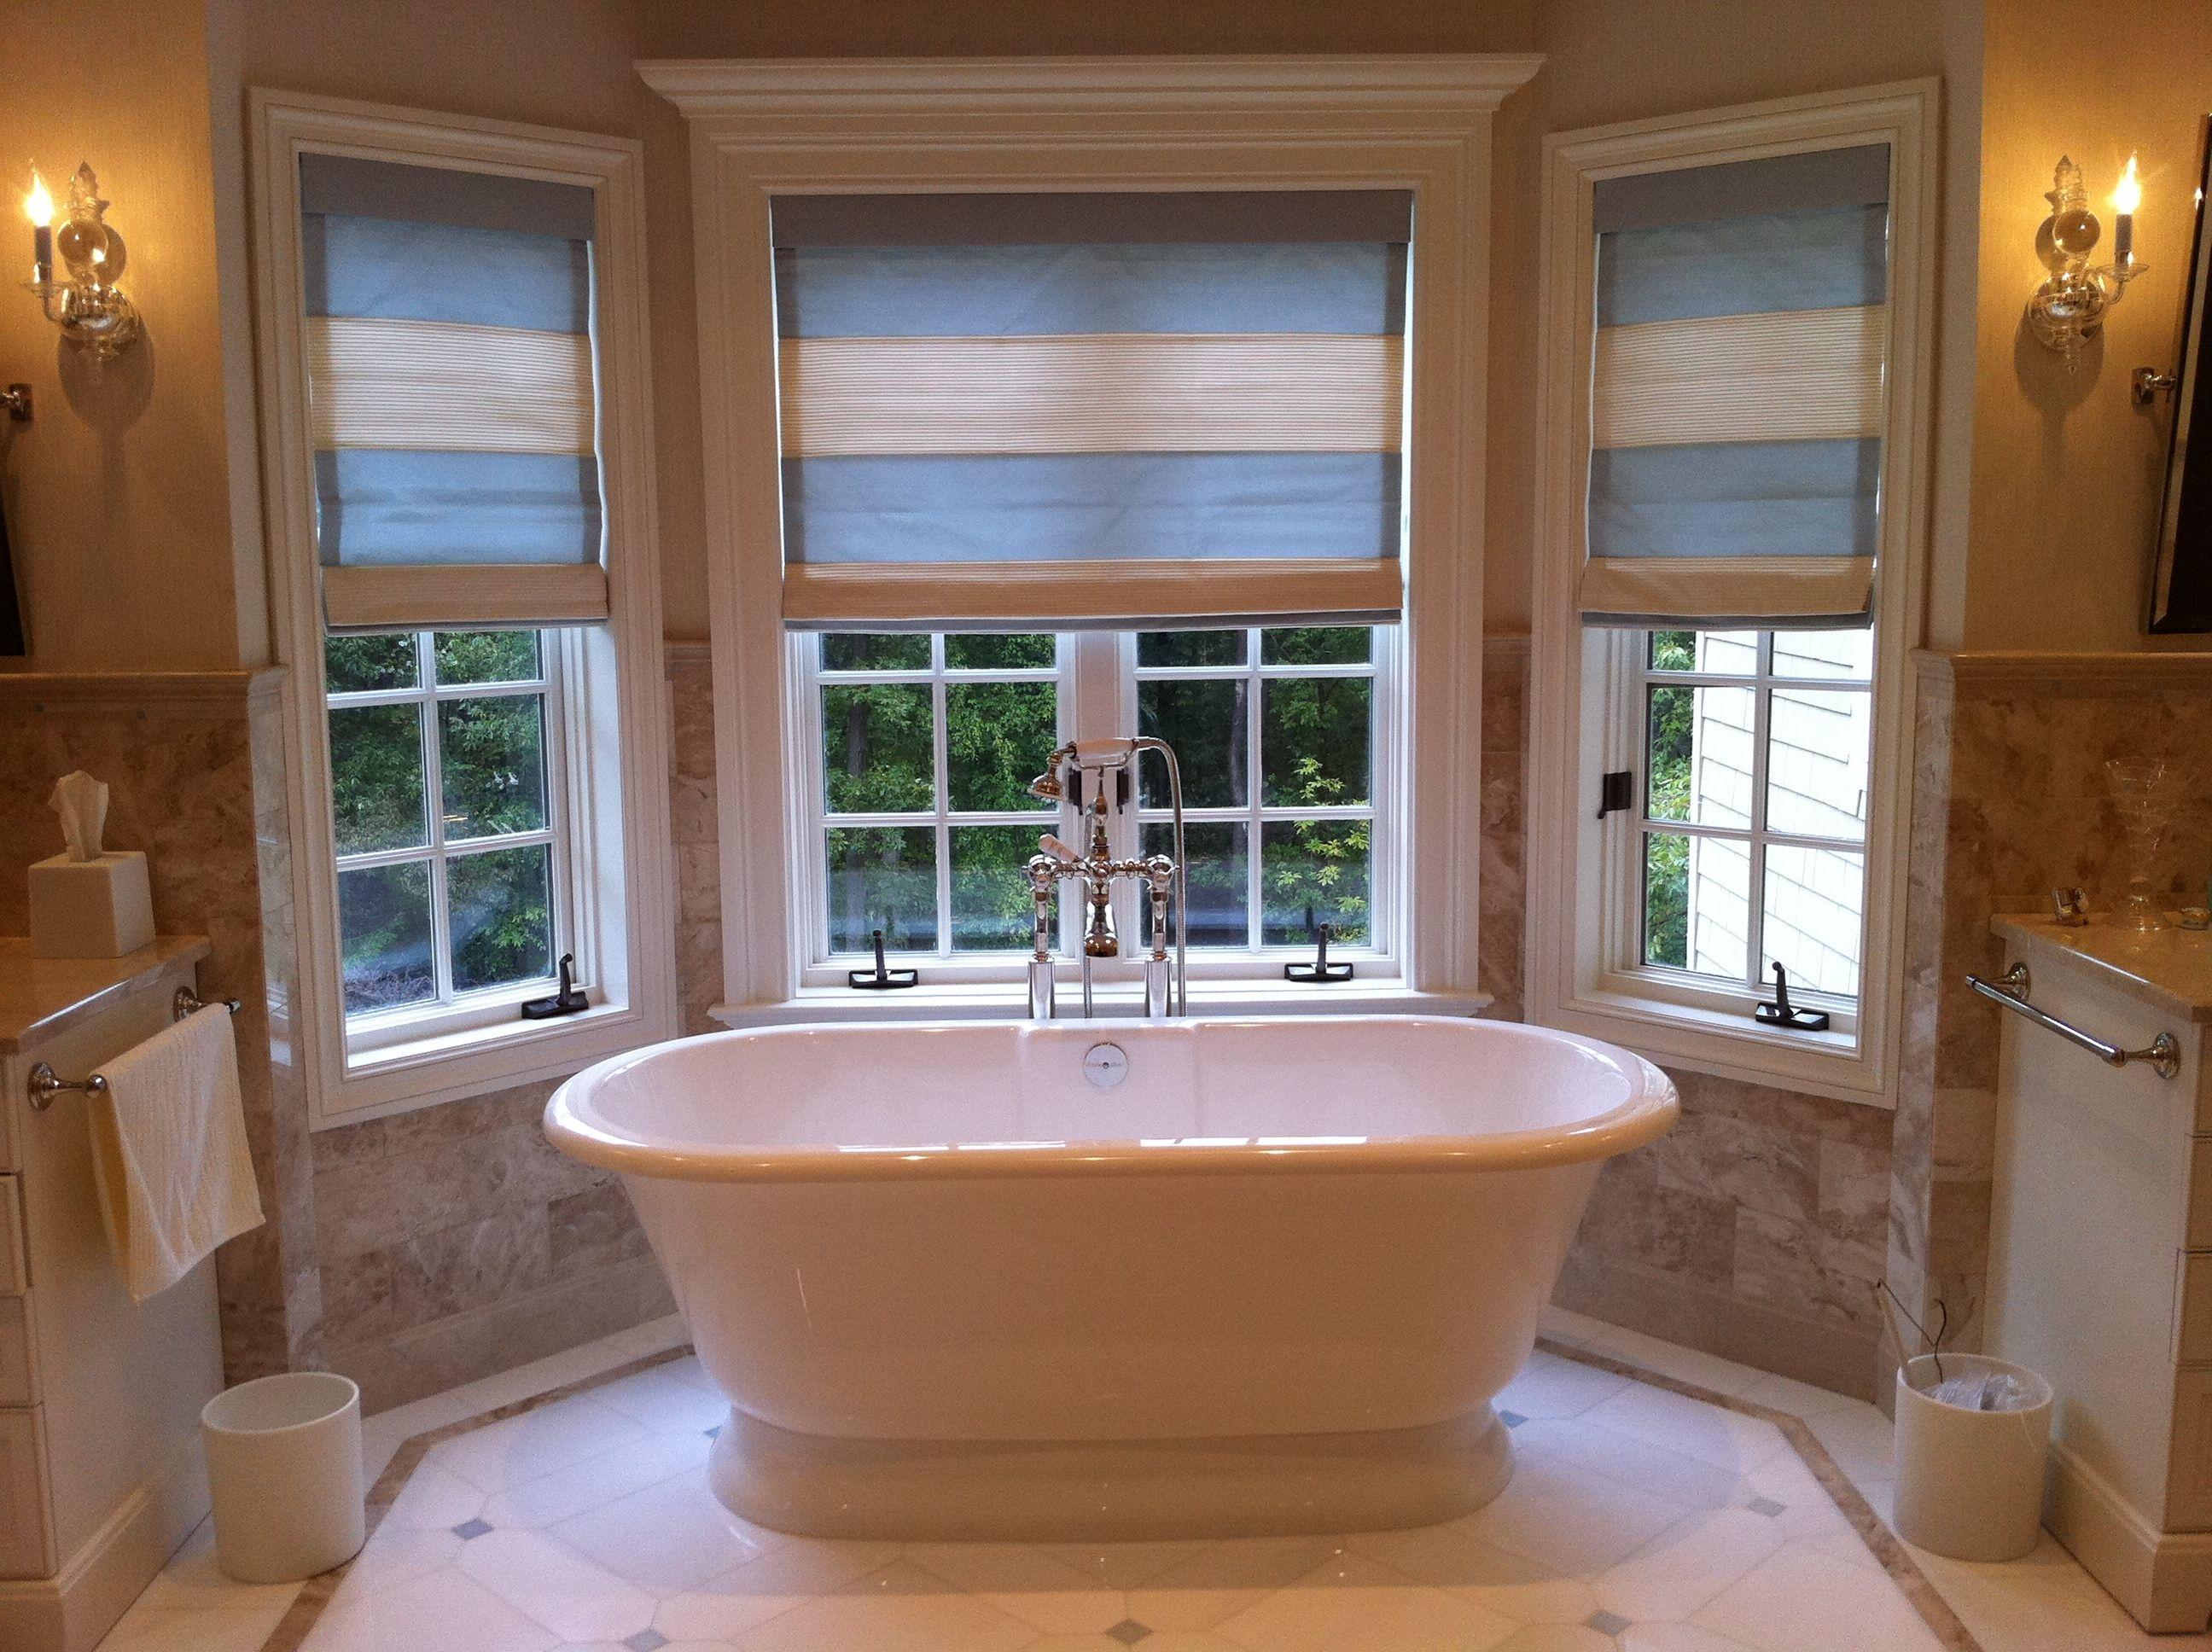 Badezimmer Fenster Behandlungen Badezimmer Fenster Ideen Klassisches Badezimmer Bad Fenster Vorhange